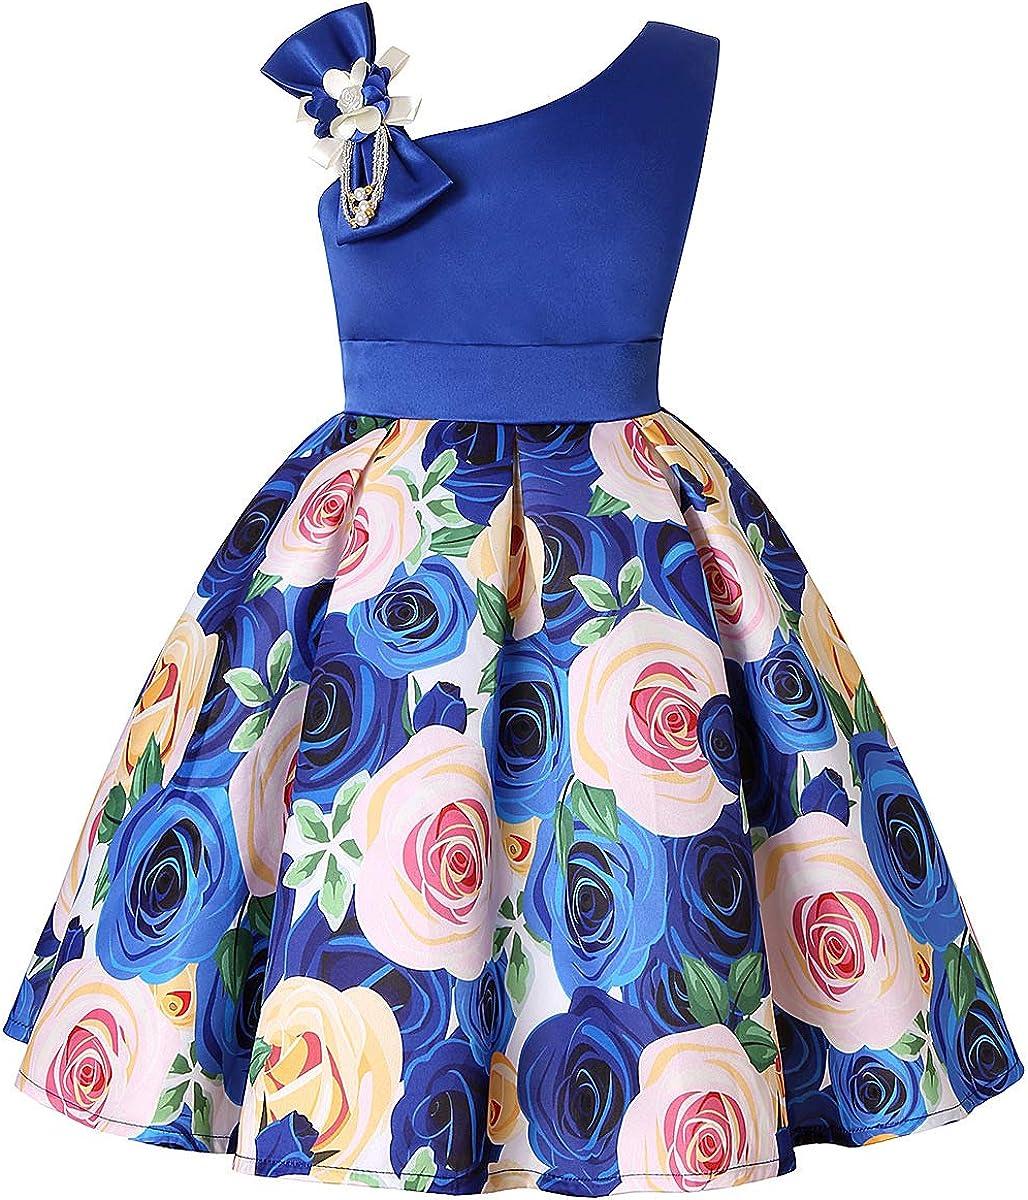 NSSMWTTC 7-7 Years Flower Girls Dresses Kids Formal Floral Dress